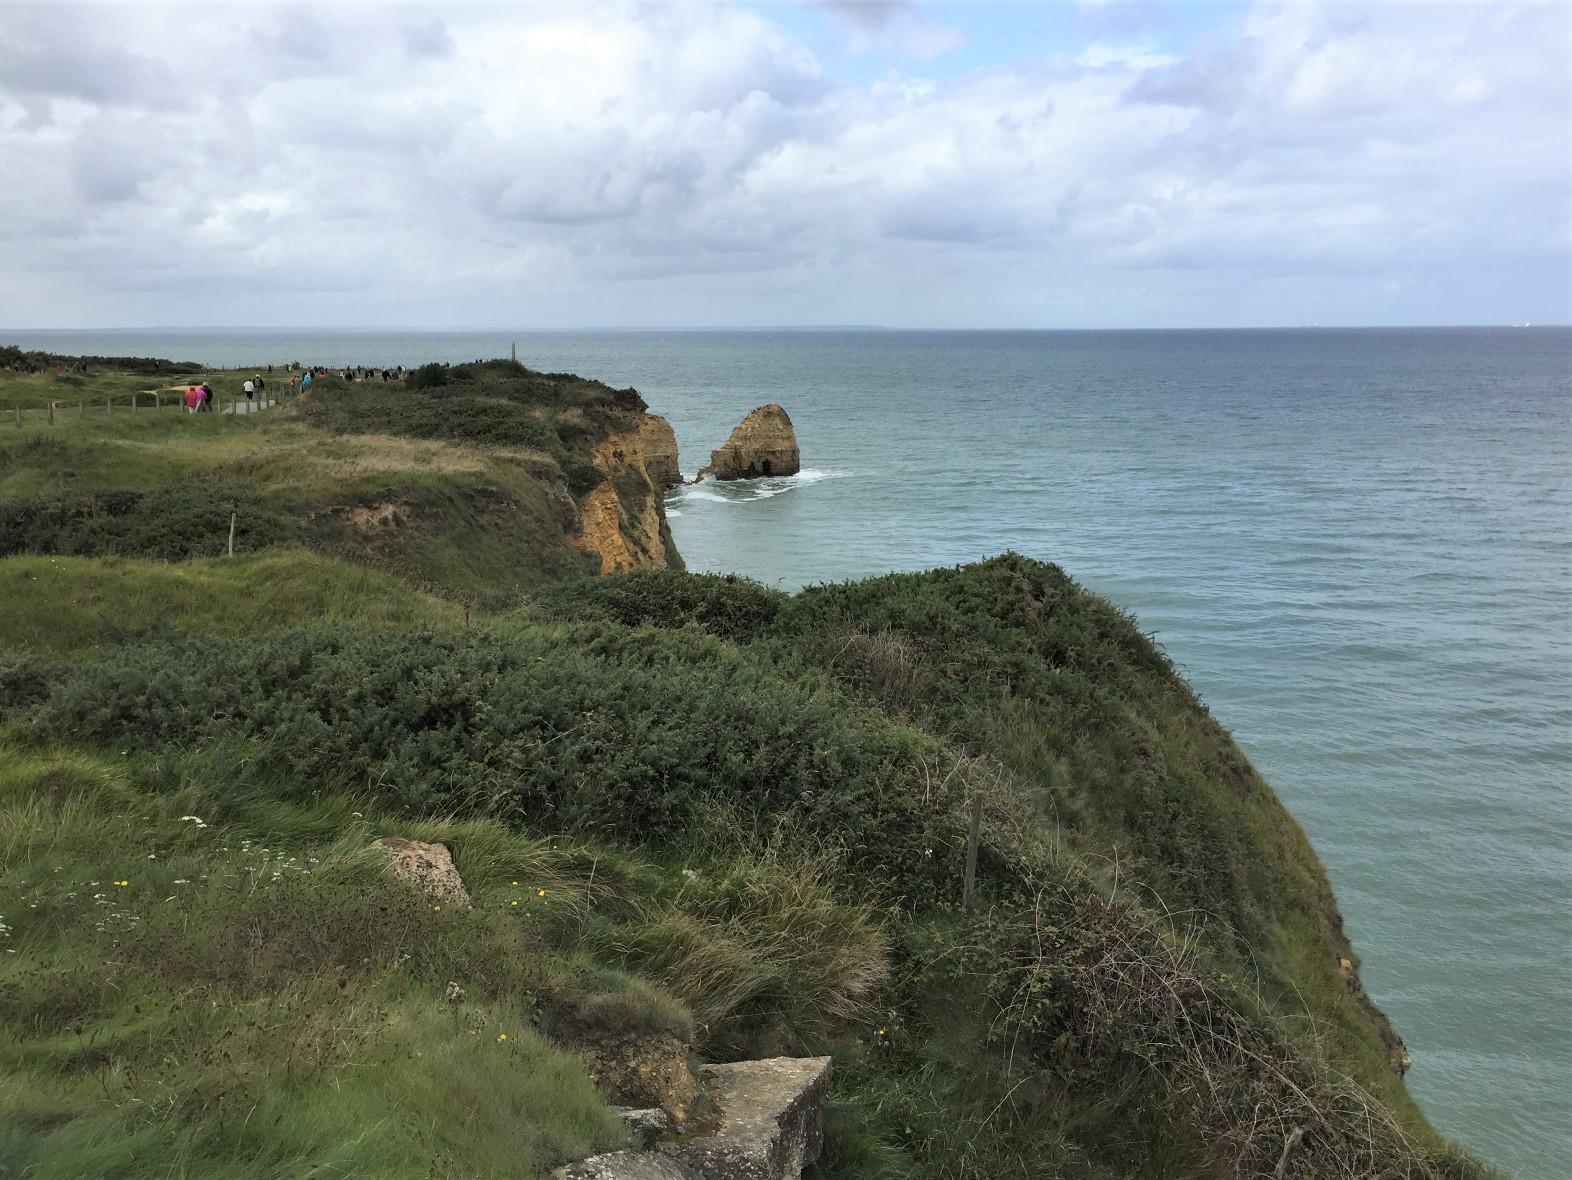 Cliffs of Pointe du Hoc (Photo: Sarah Sundin, September 2017)